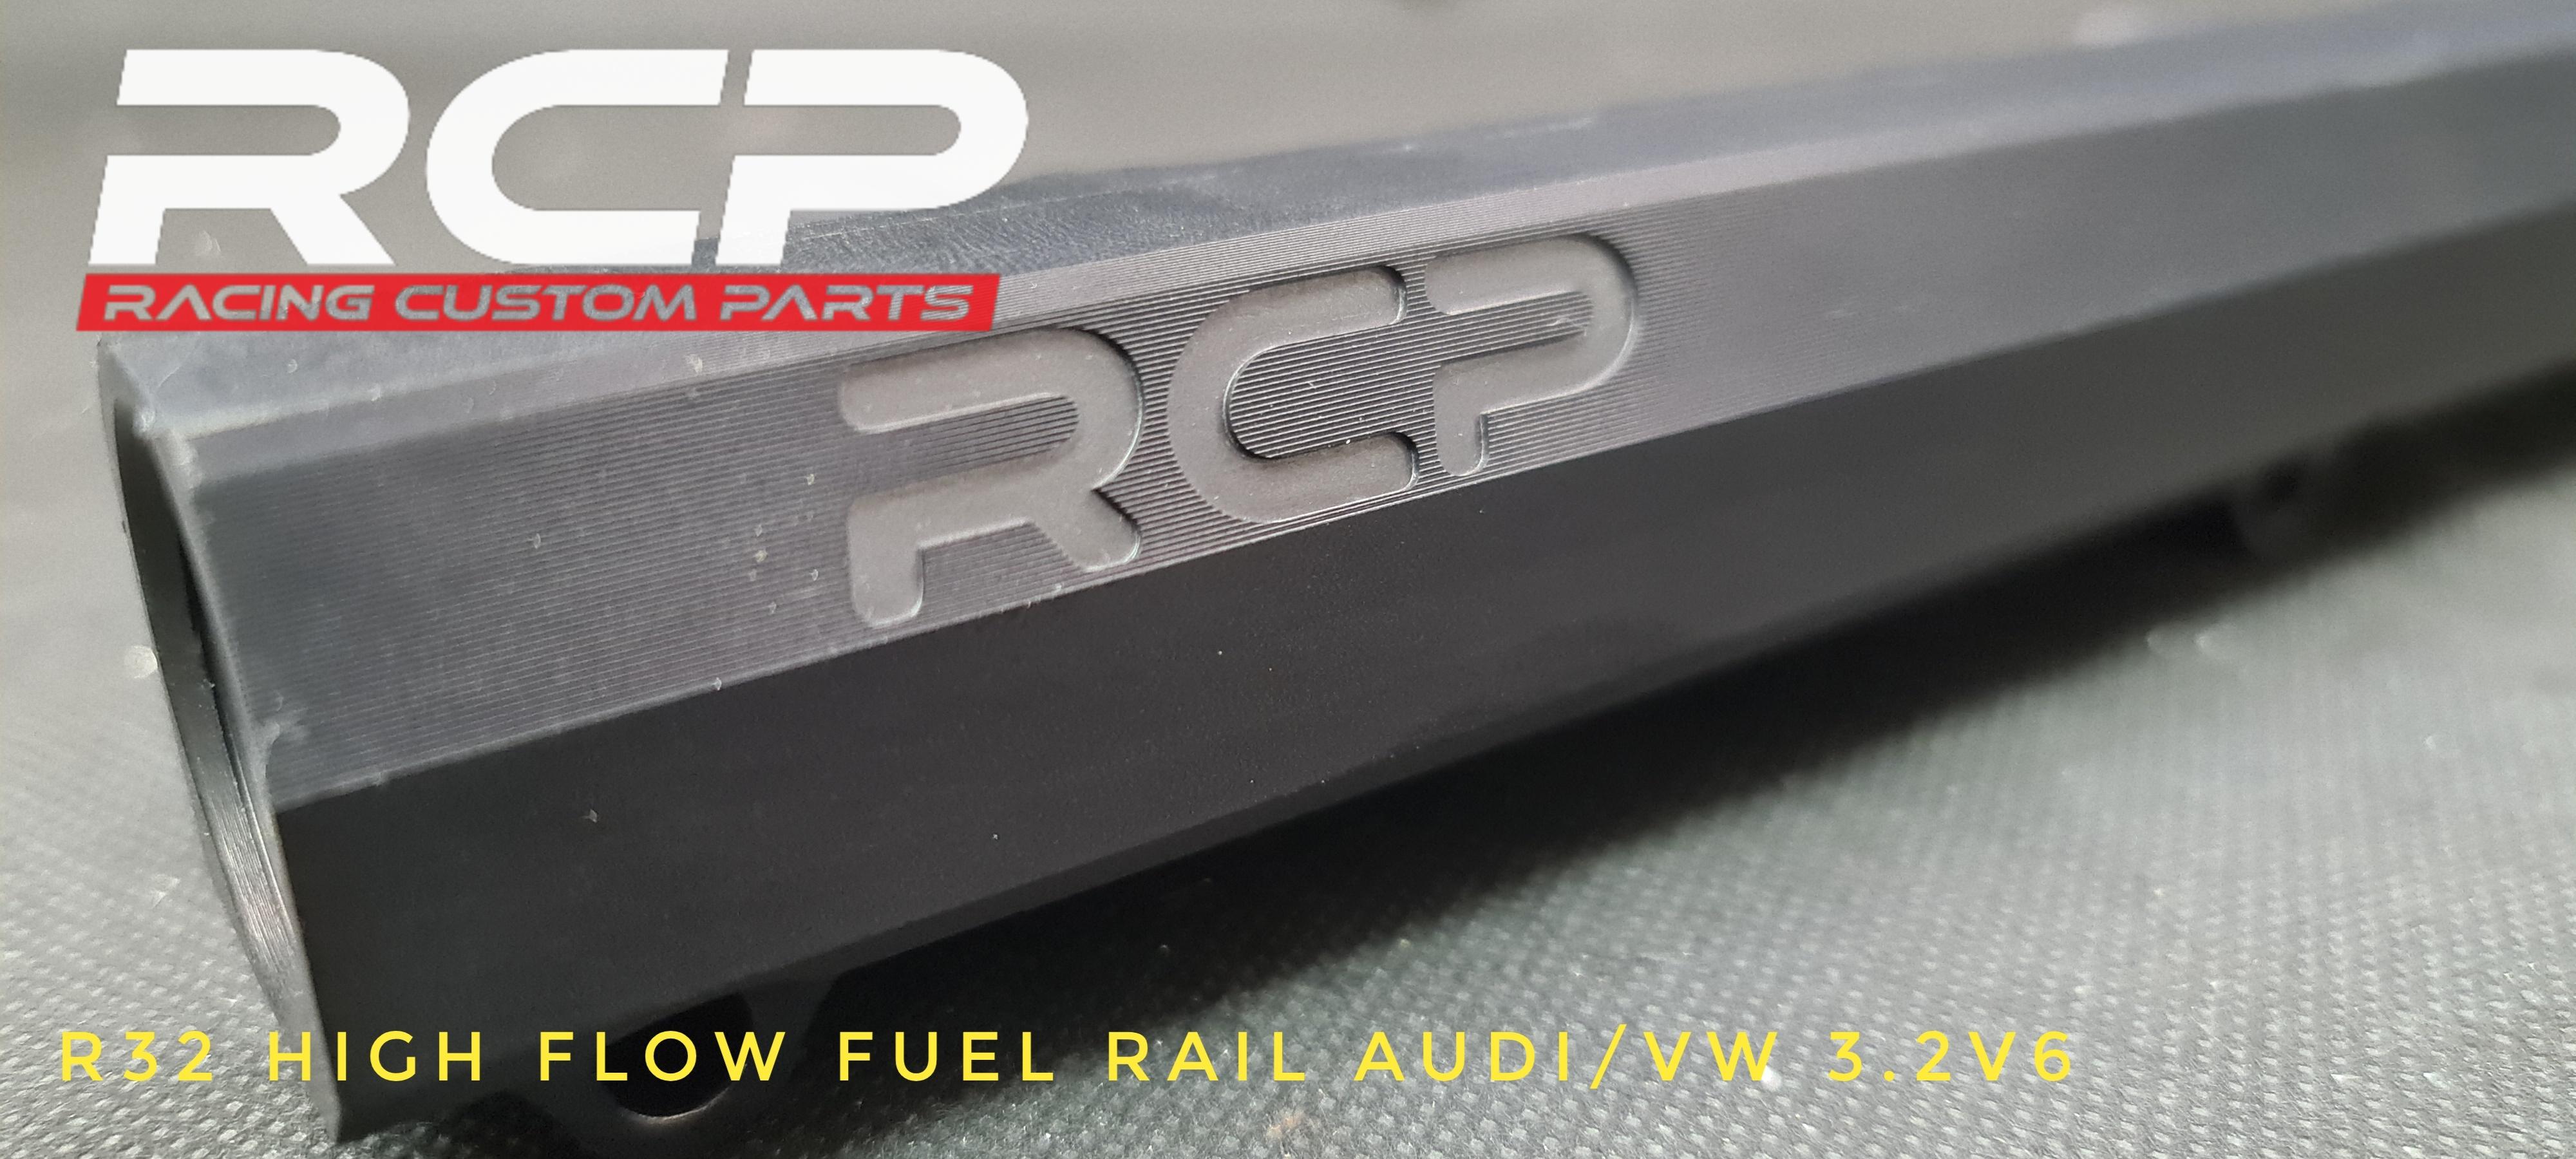 r32 high flow fuel rail 3.2v6 intake manifold, turbo more power rcp billet cnc racing custom parts